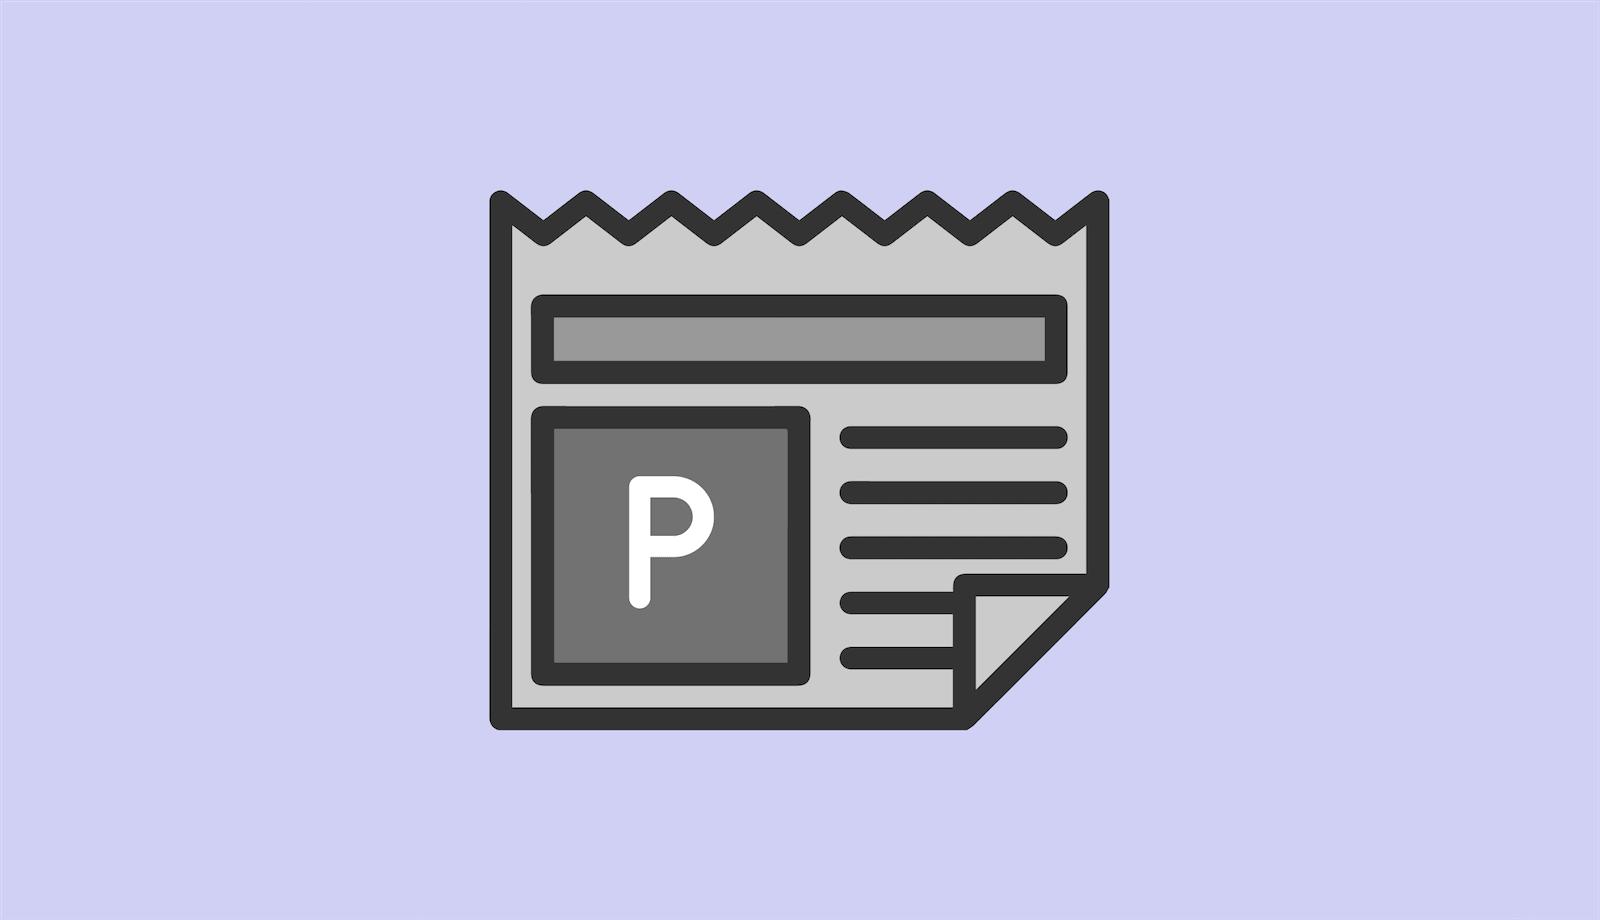 PUBGモバイル:P1911・P92・P18Cの評価とおすすめアタッチメント